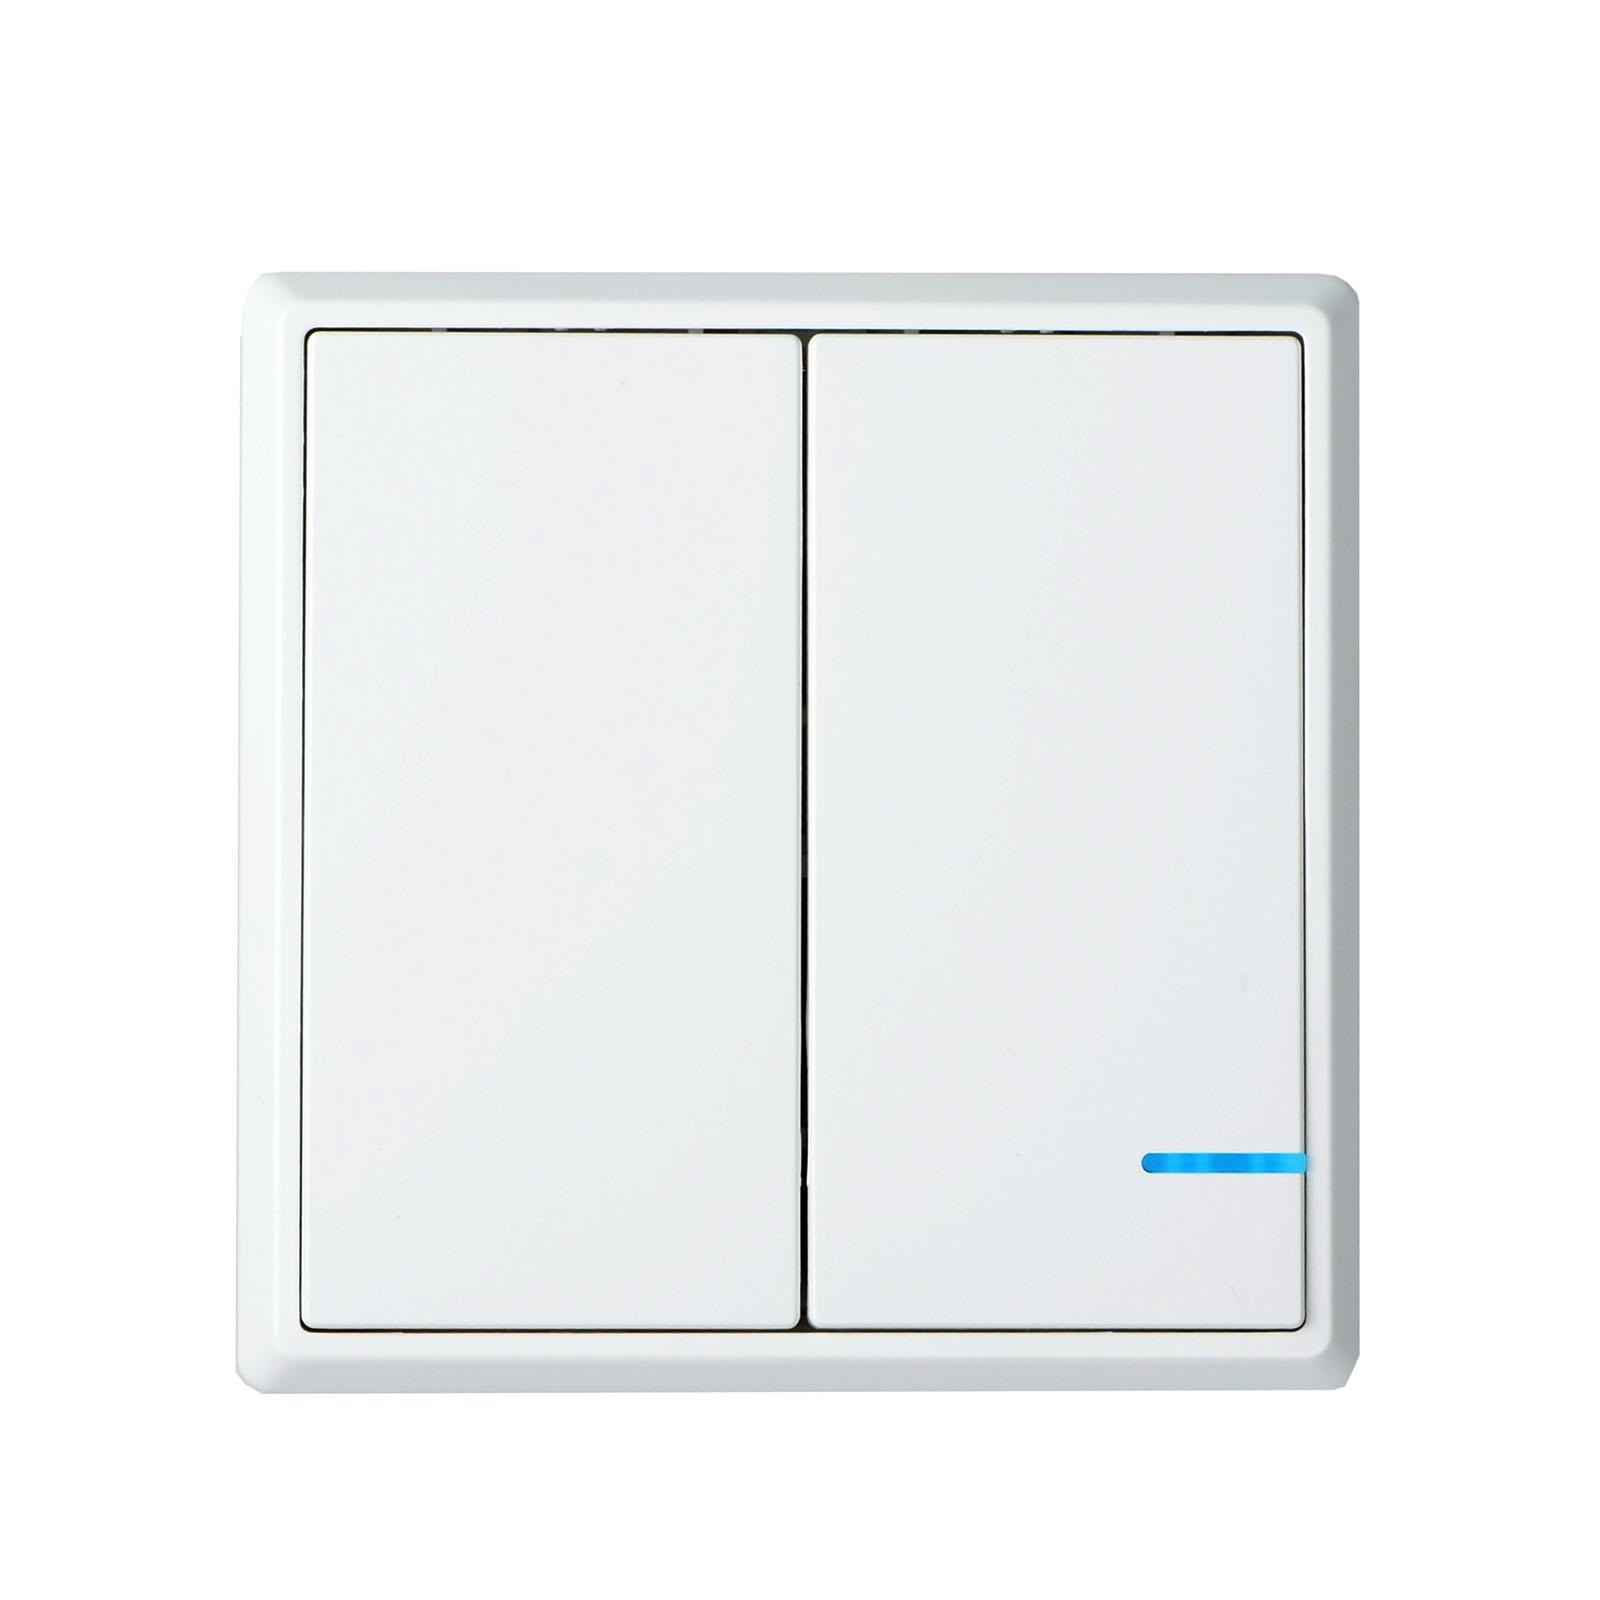 1 pk 2 way wireless switch 2 pk remote receiver smart wireless wall 1 pk 2 way wireless switch 2 pk aloadofball Gallery